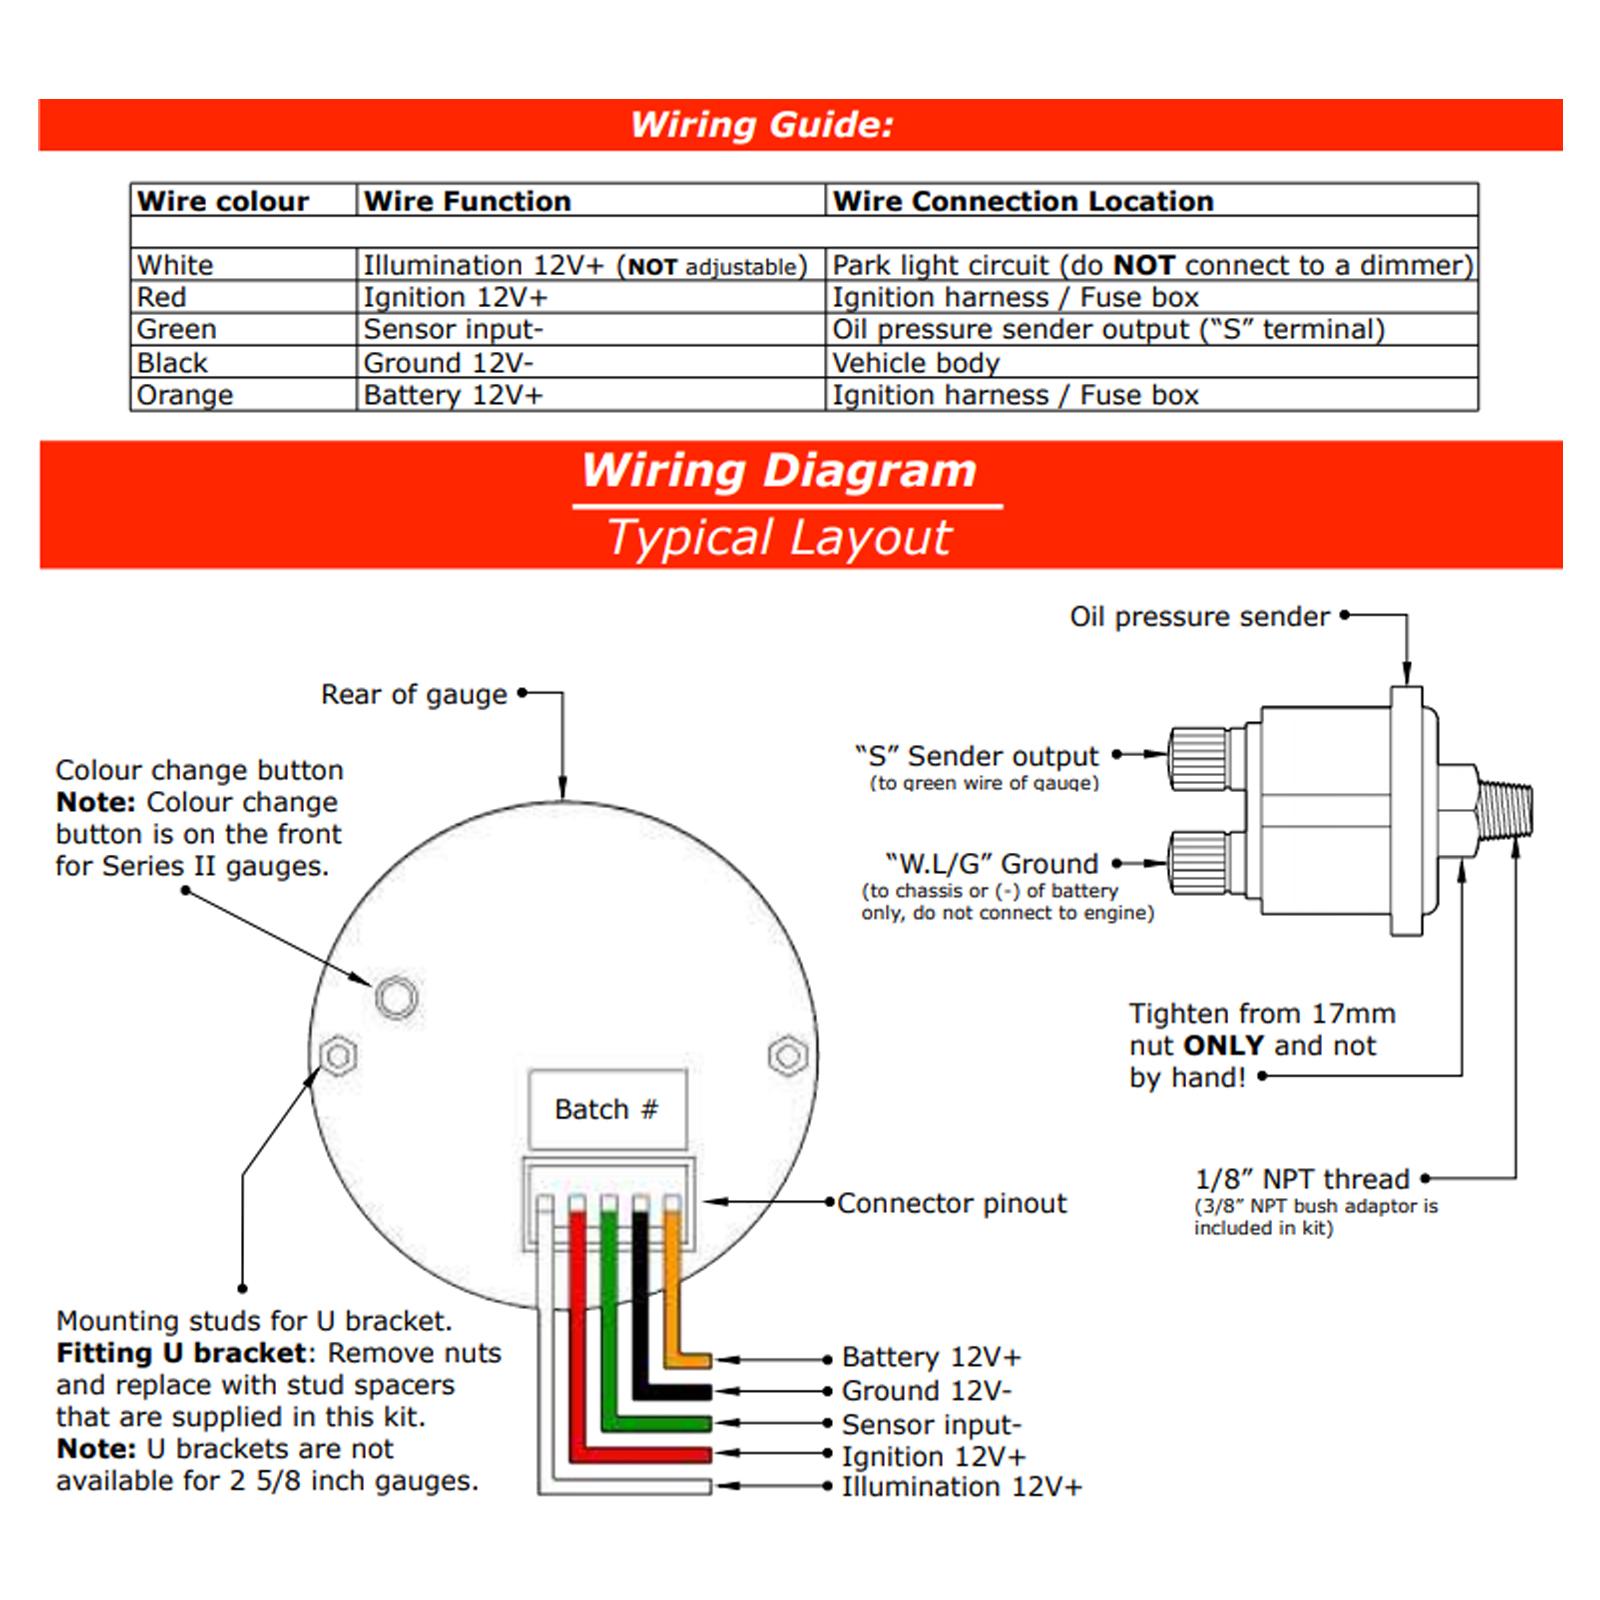 Auto Gauge Wiring Diagram - 2006 Chevy Trailblazer Engine Diagram -  dodyjm.pro-wirings.decorresine.itWiring Diagram Resource